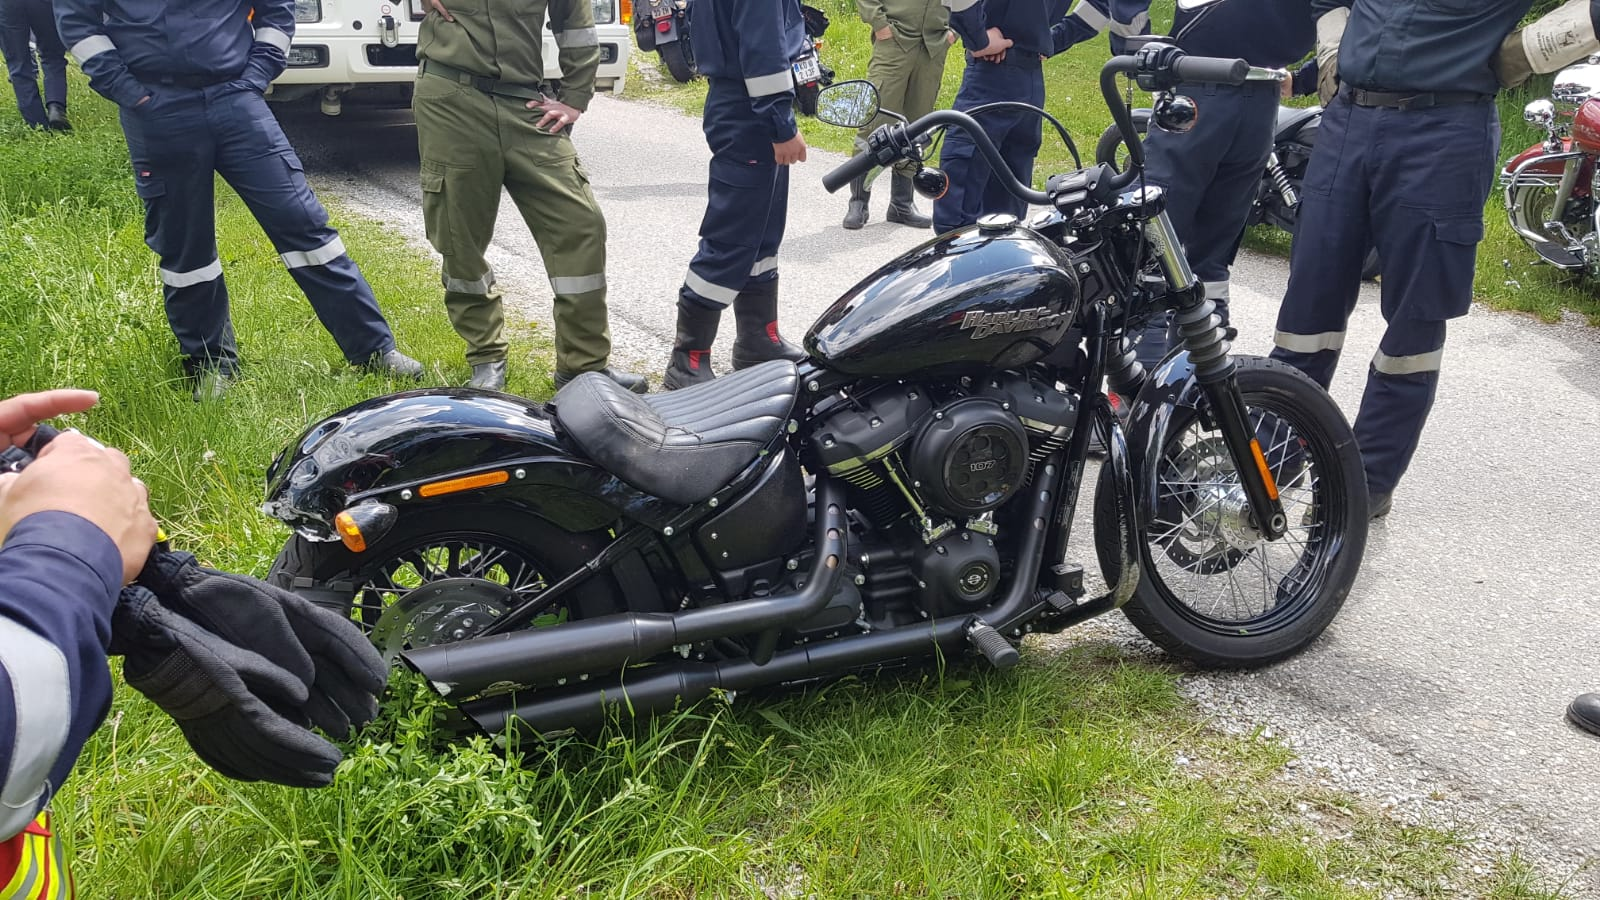 2020-05-17-Motorradbergung-Neusiedl-03